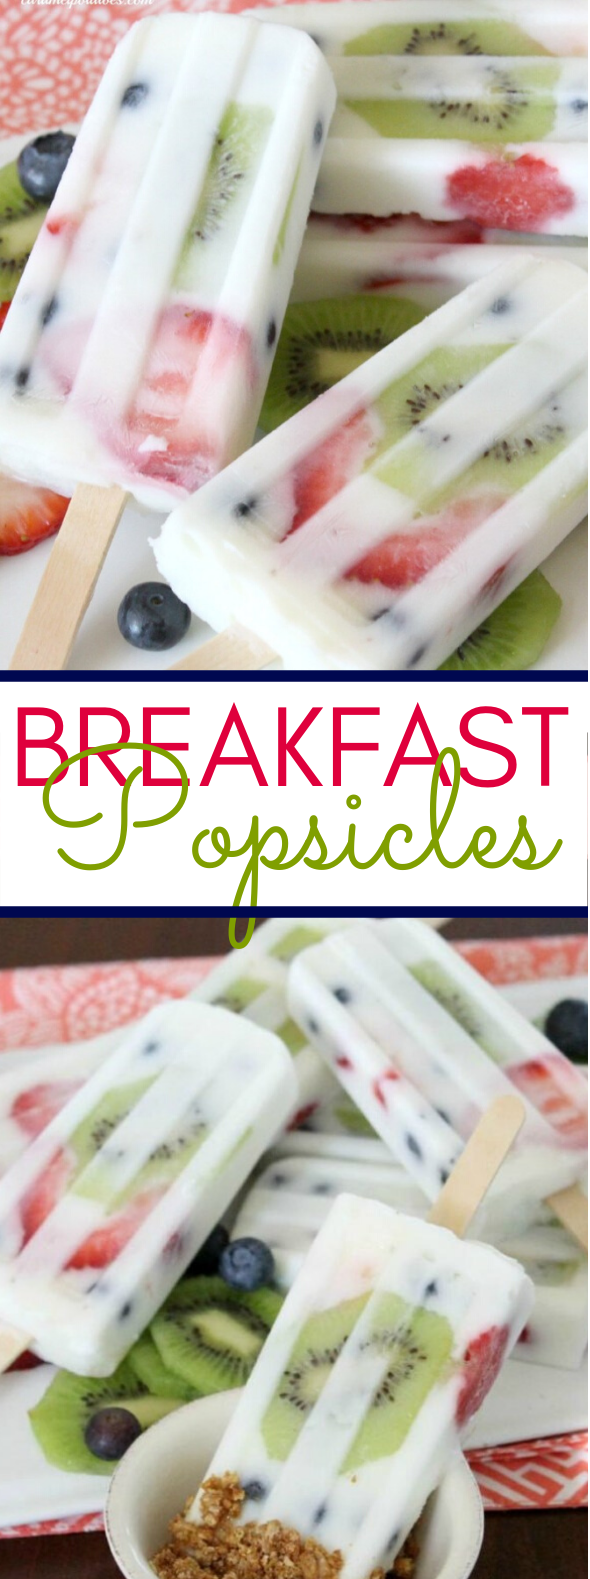 Breakfast Popsicles #desserts #frozenrecipe